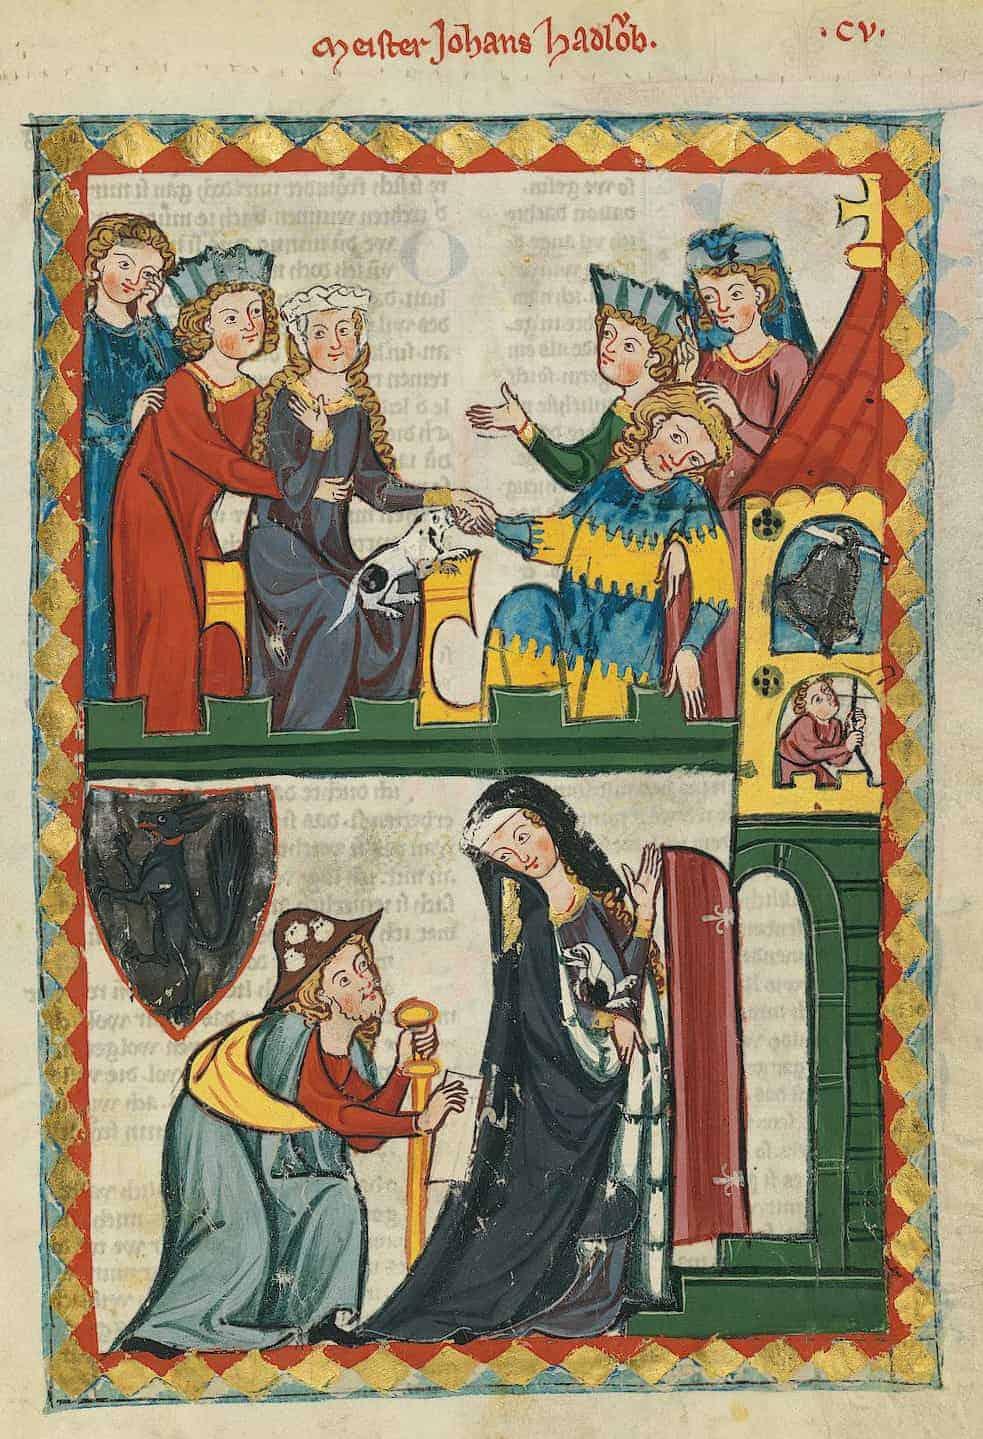 Early 14th century fashion